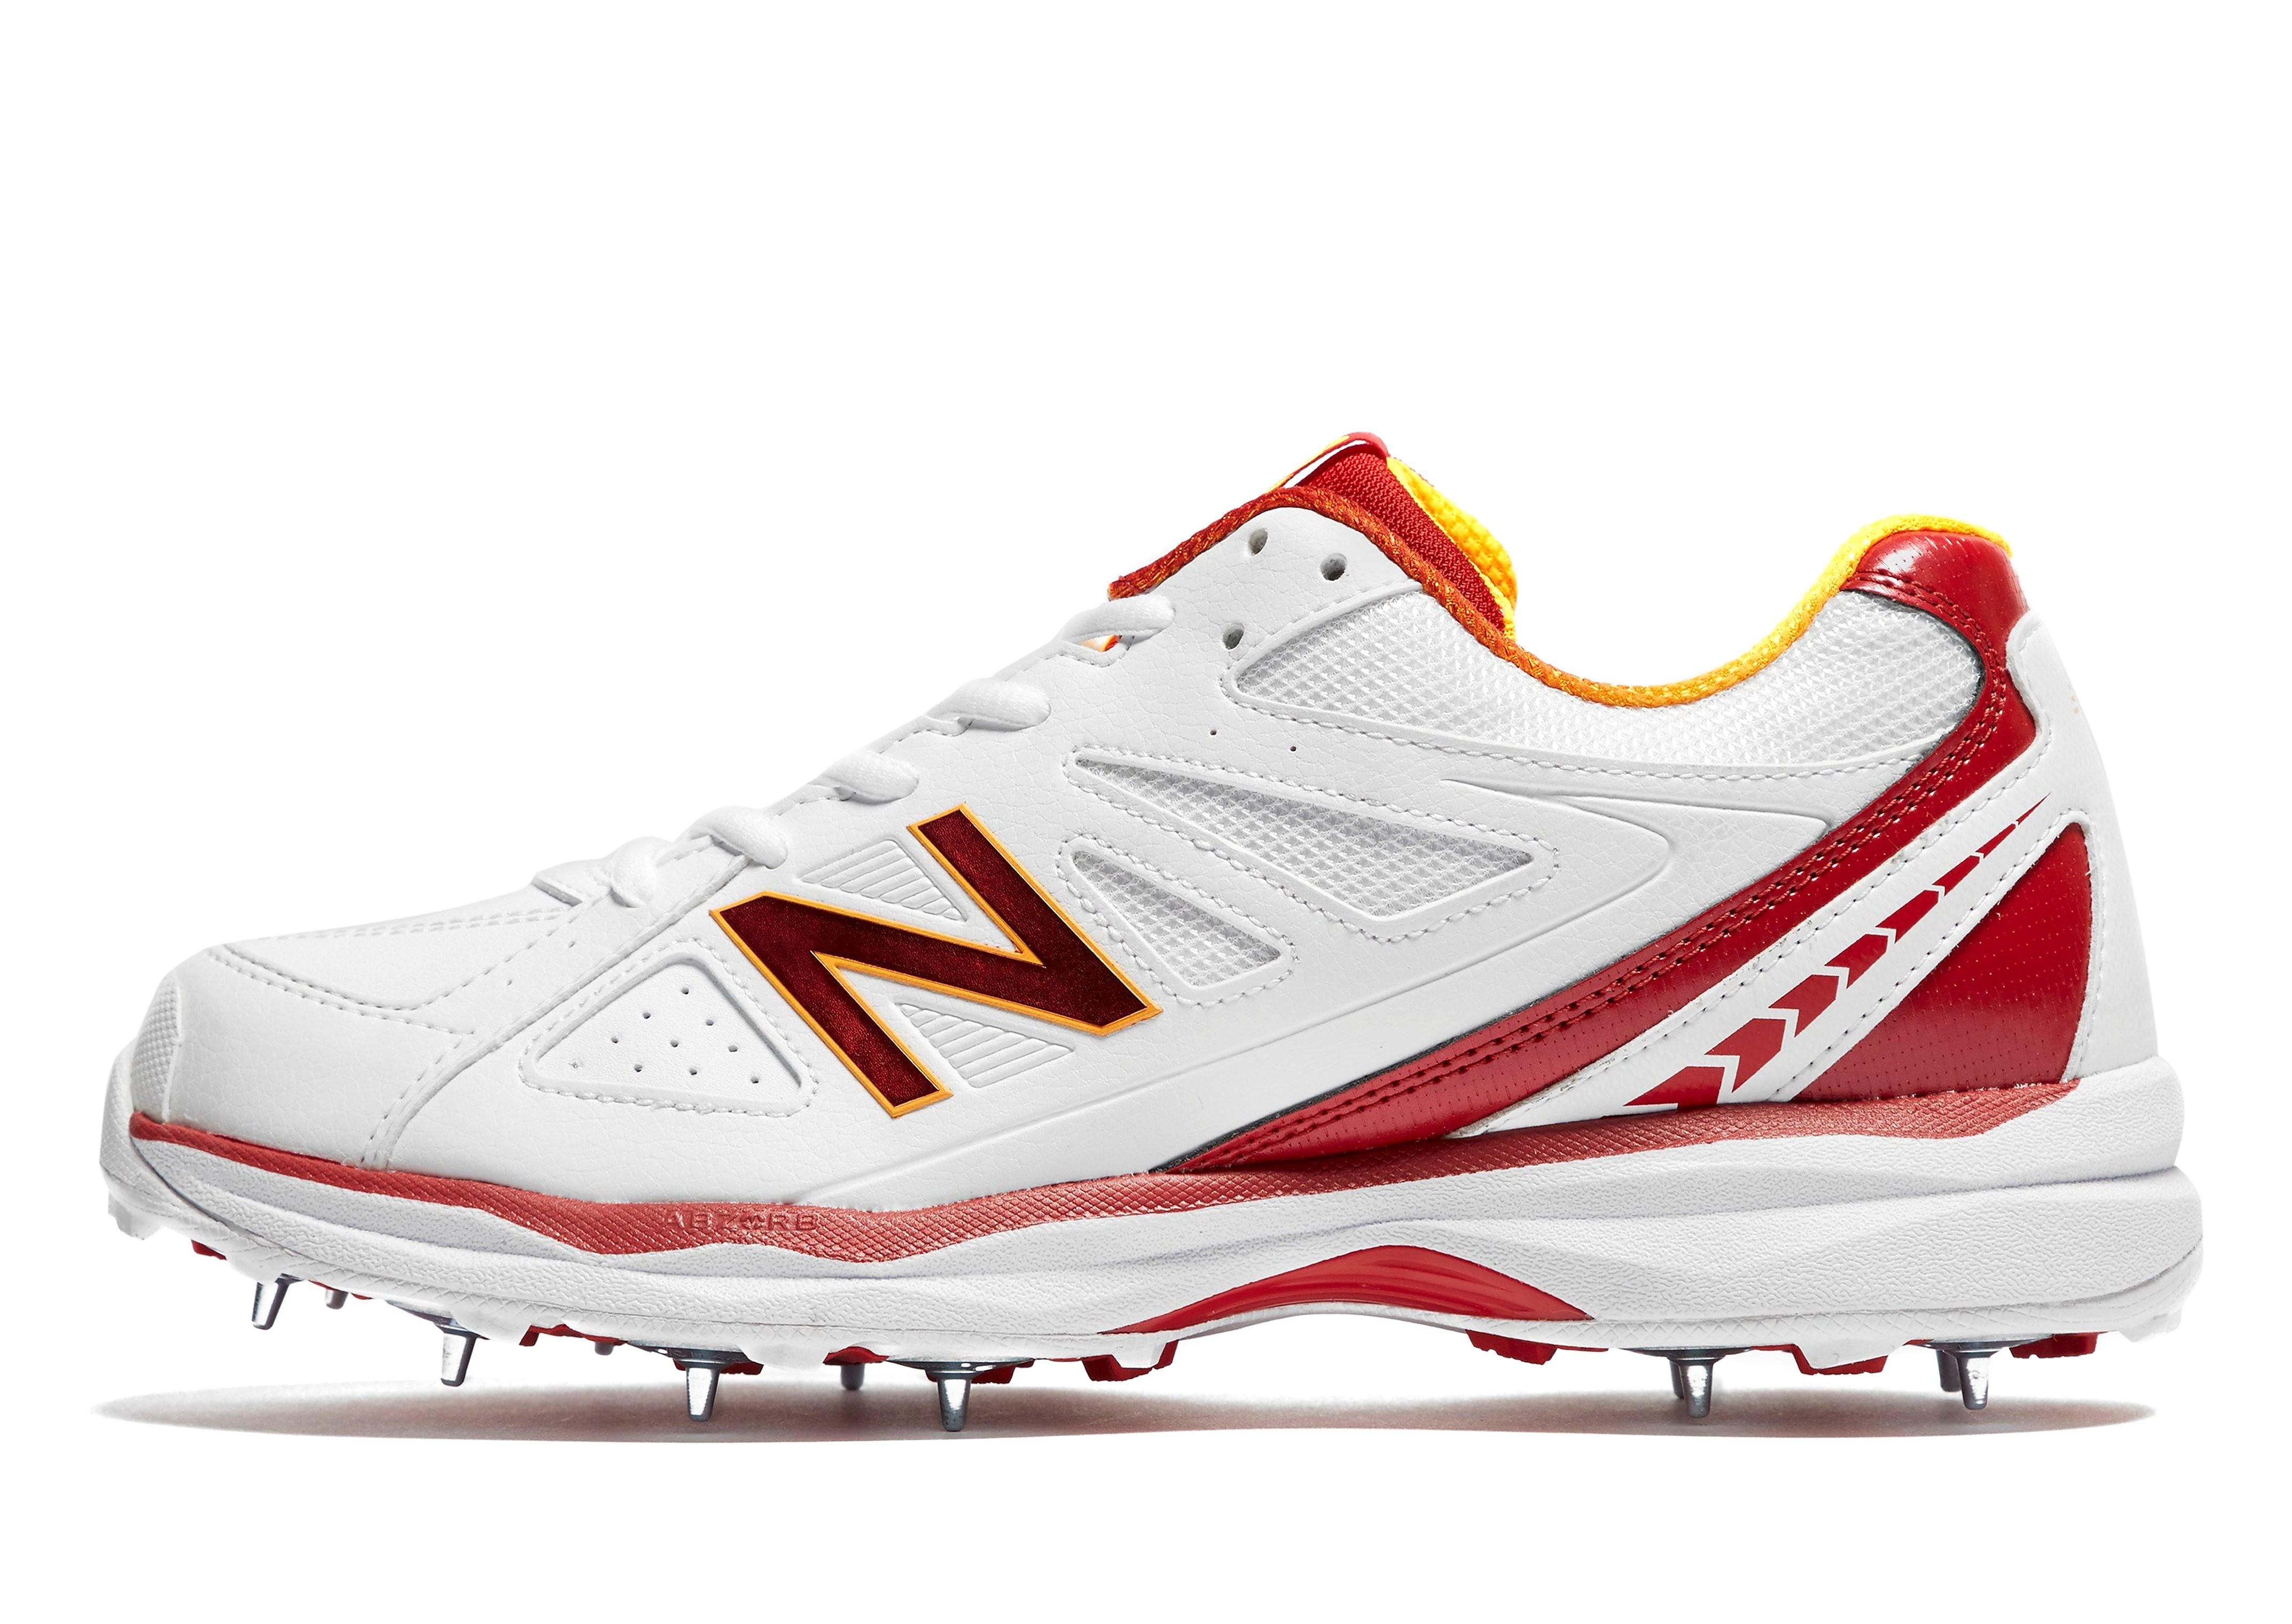 New Balance  4030v2 Men's Cricket Shoes